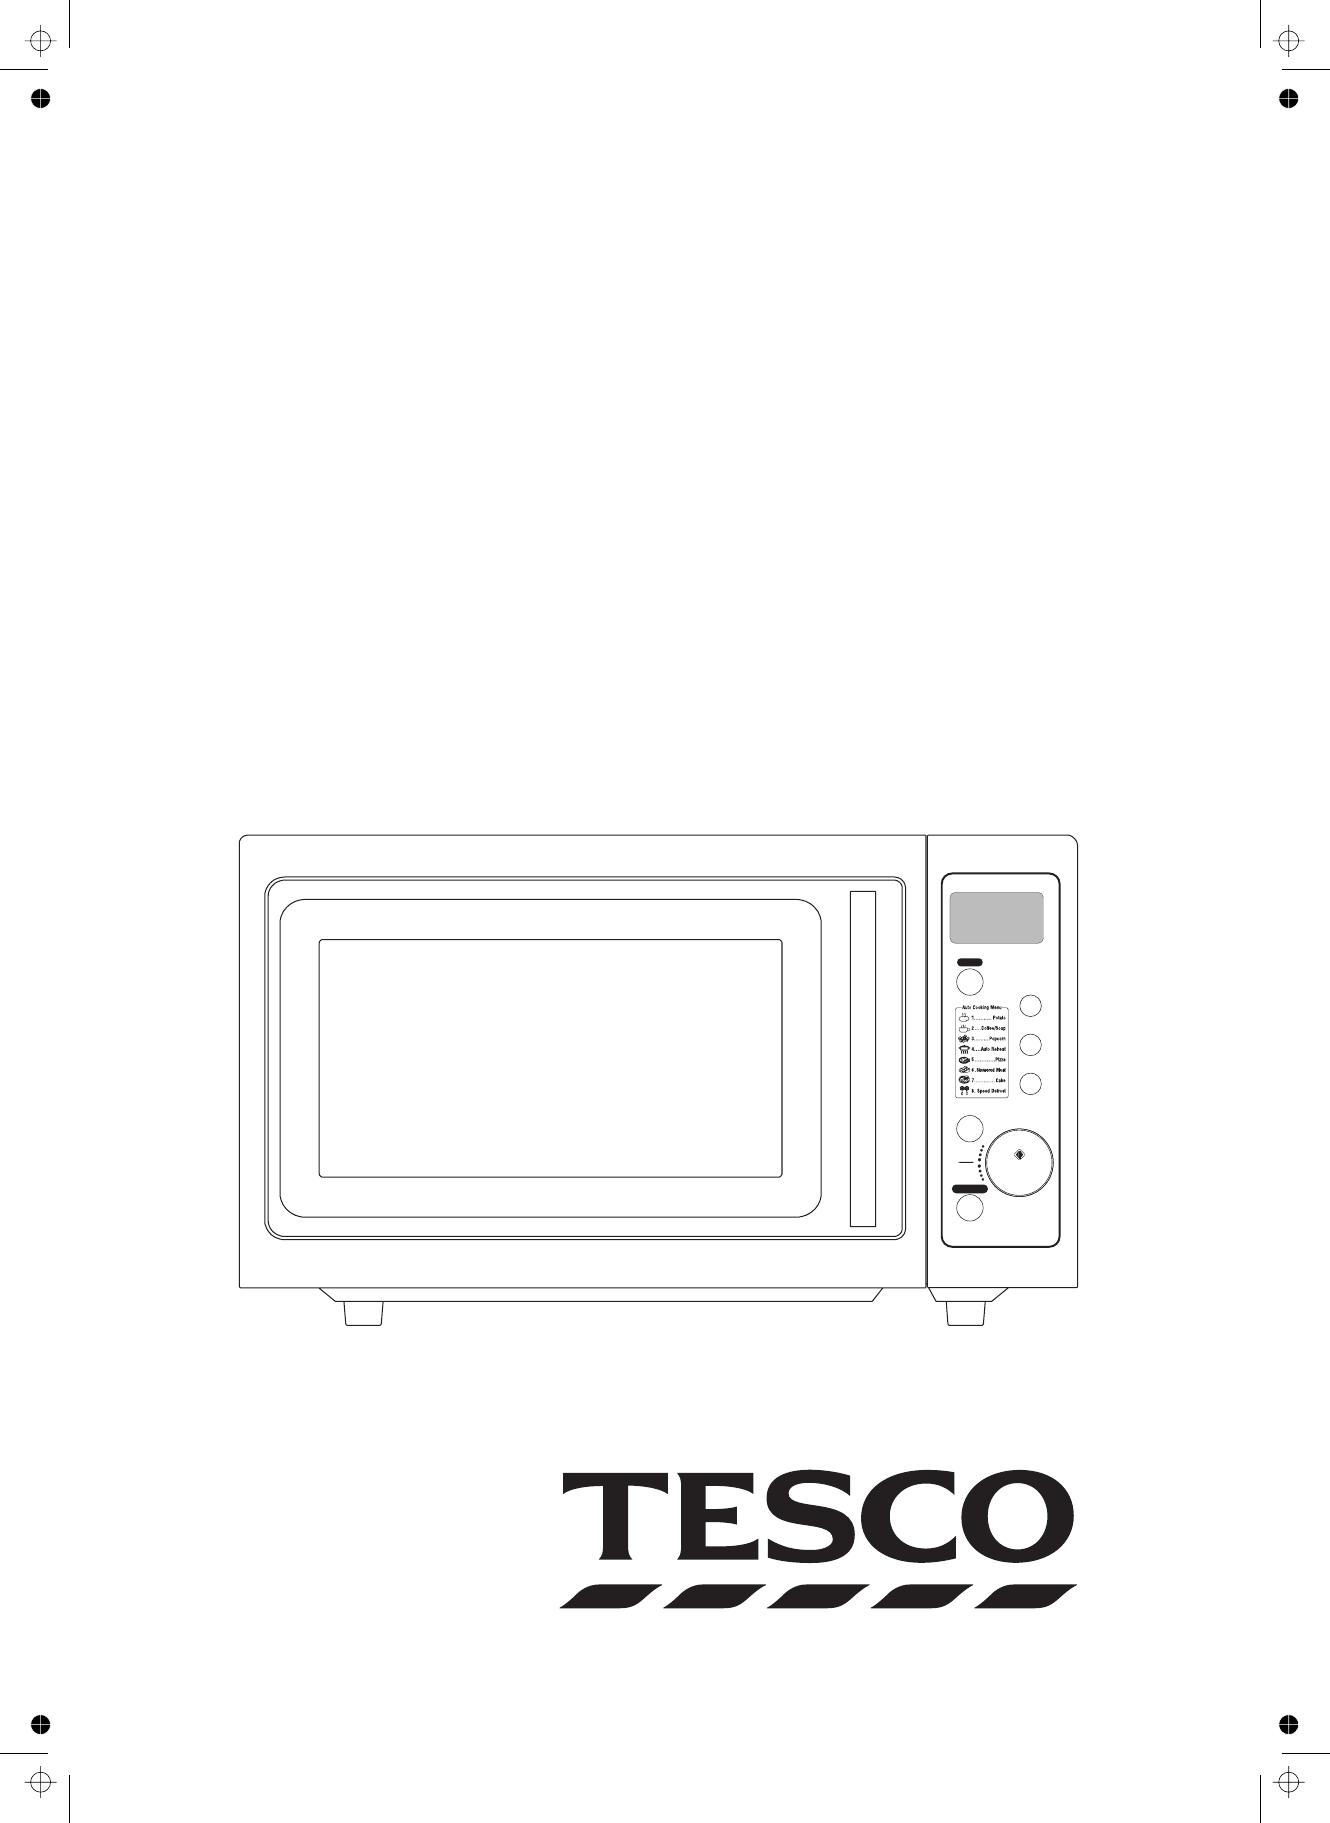 Tesco Mc209 Manual